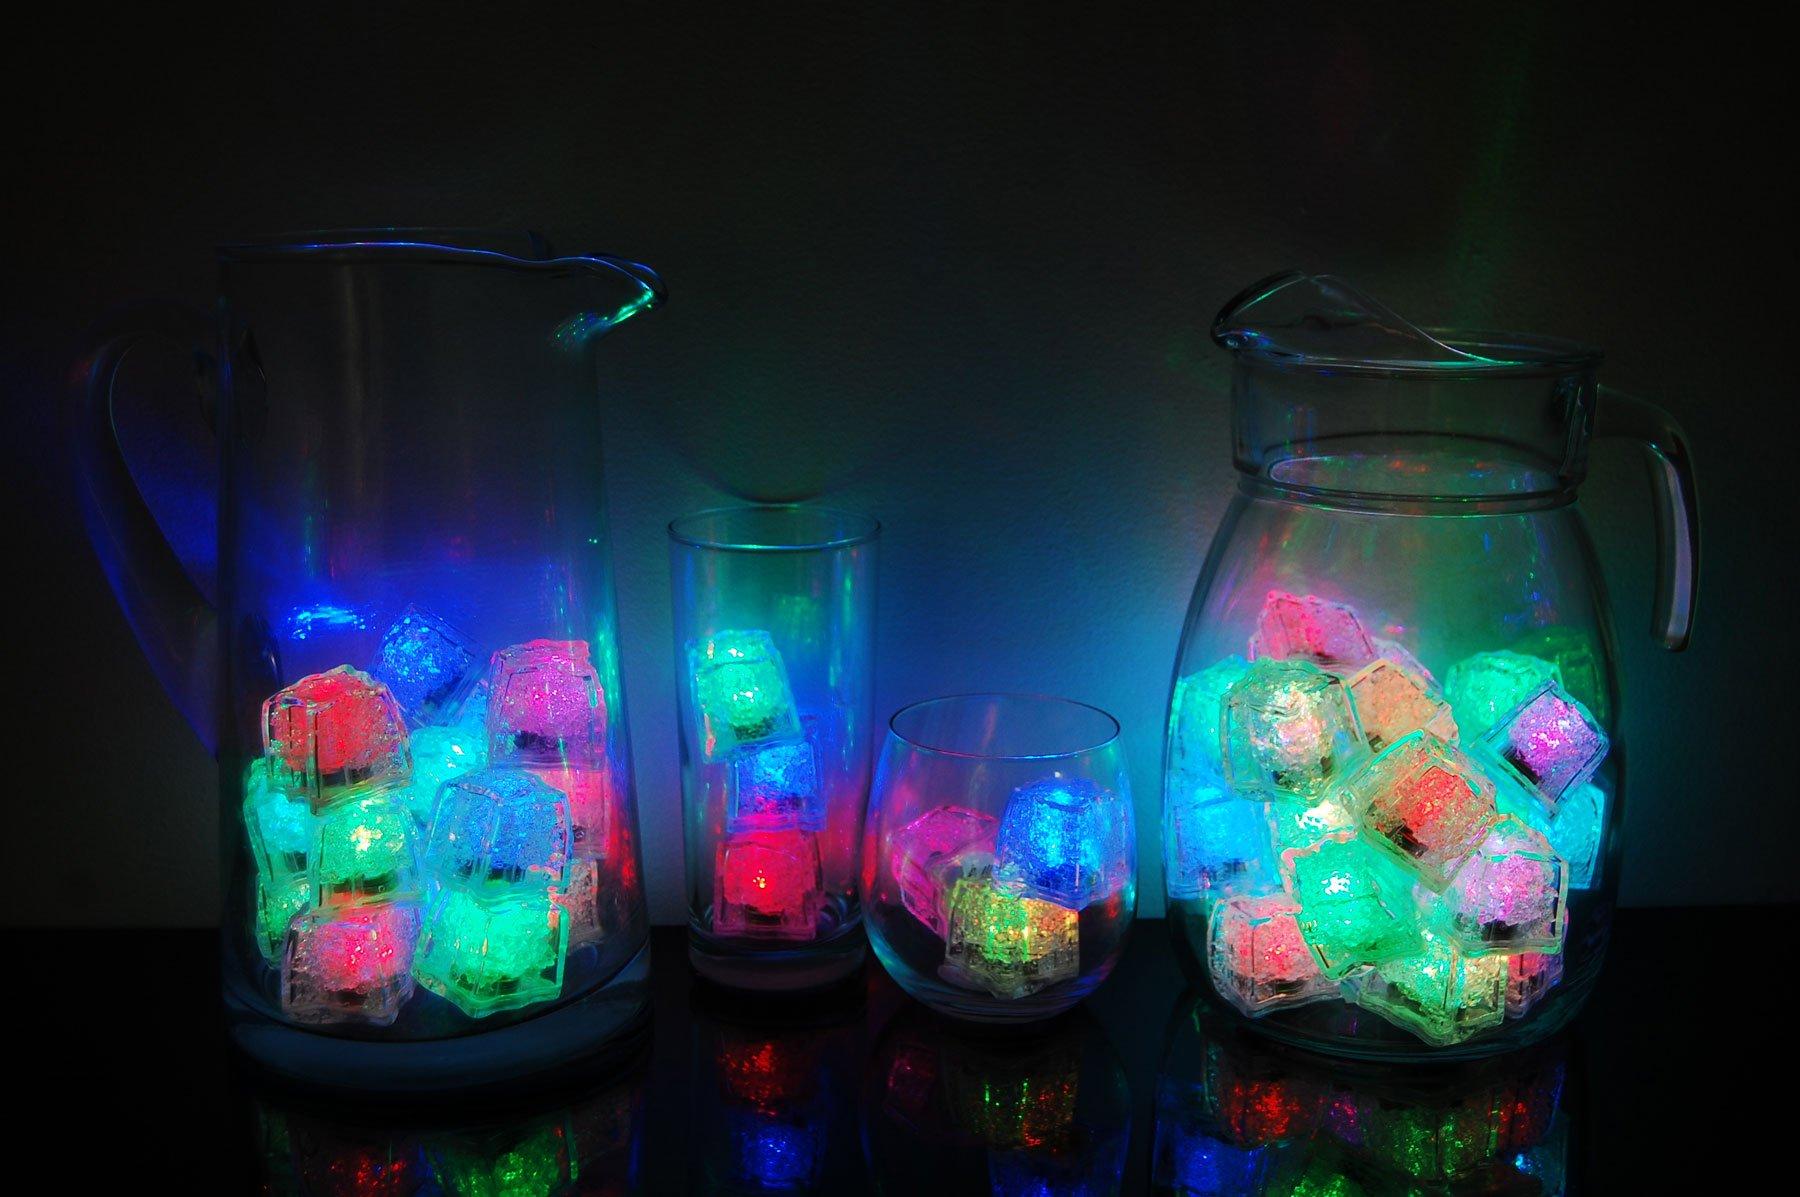 LiteCubes Set of 48 Brand 8 Mode MultiColor RAINBOW Light up LED Ice Cubes … by LiteCubes (Image #2)